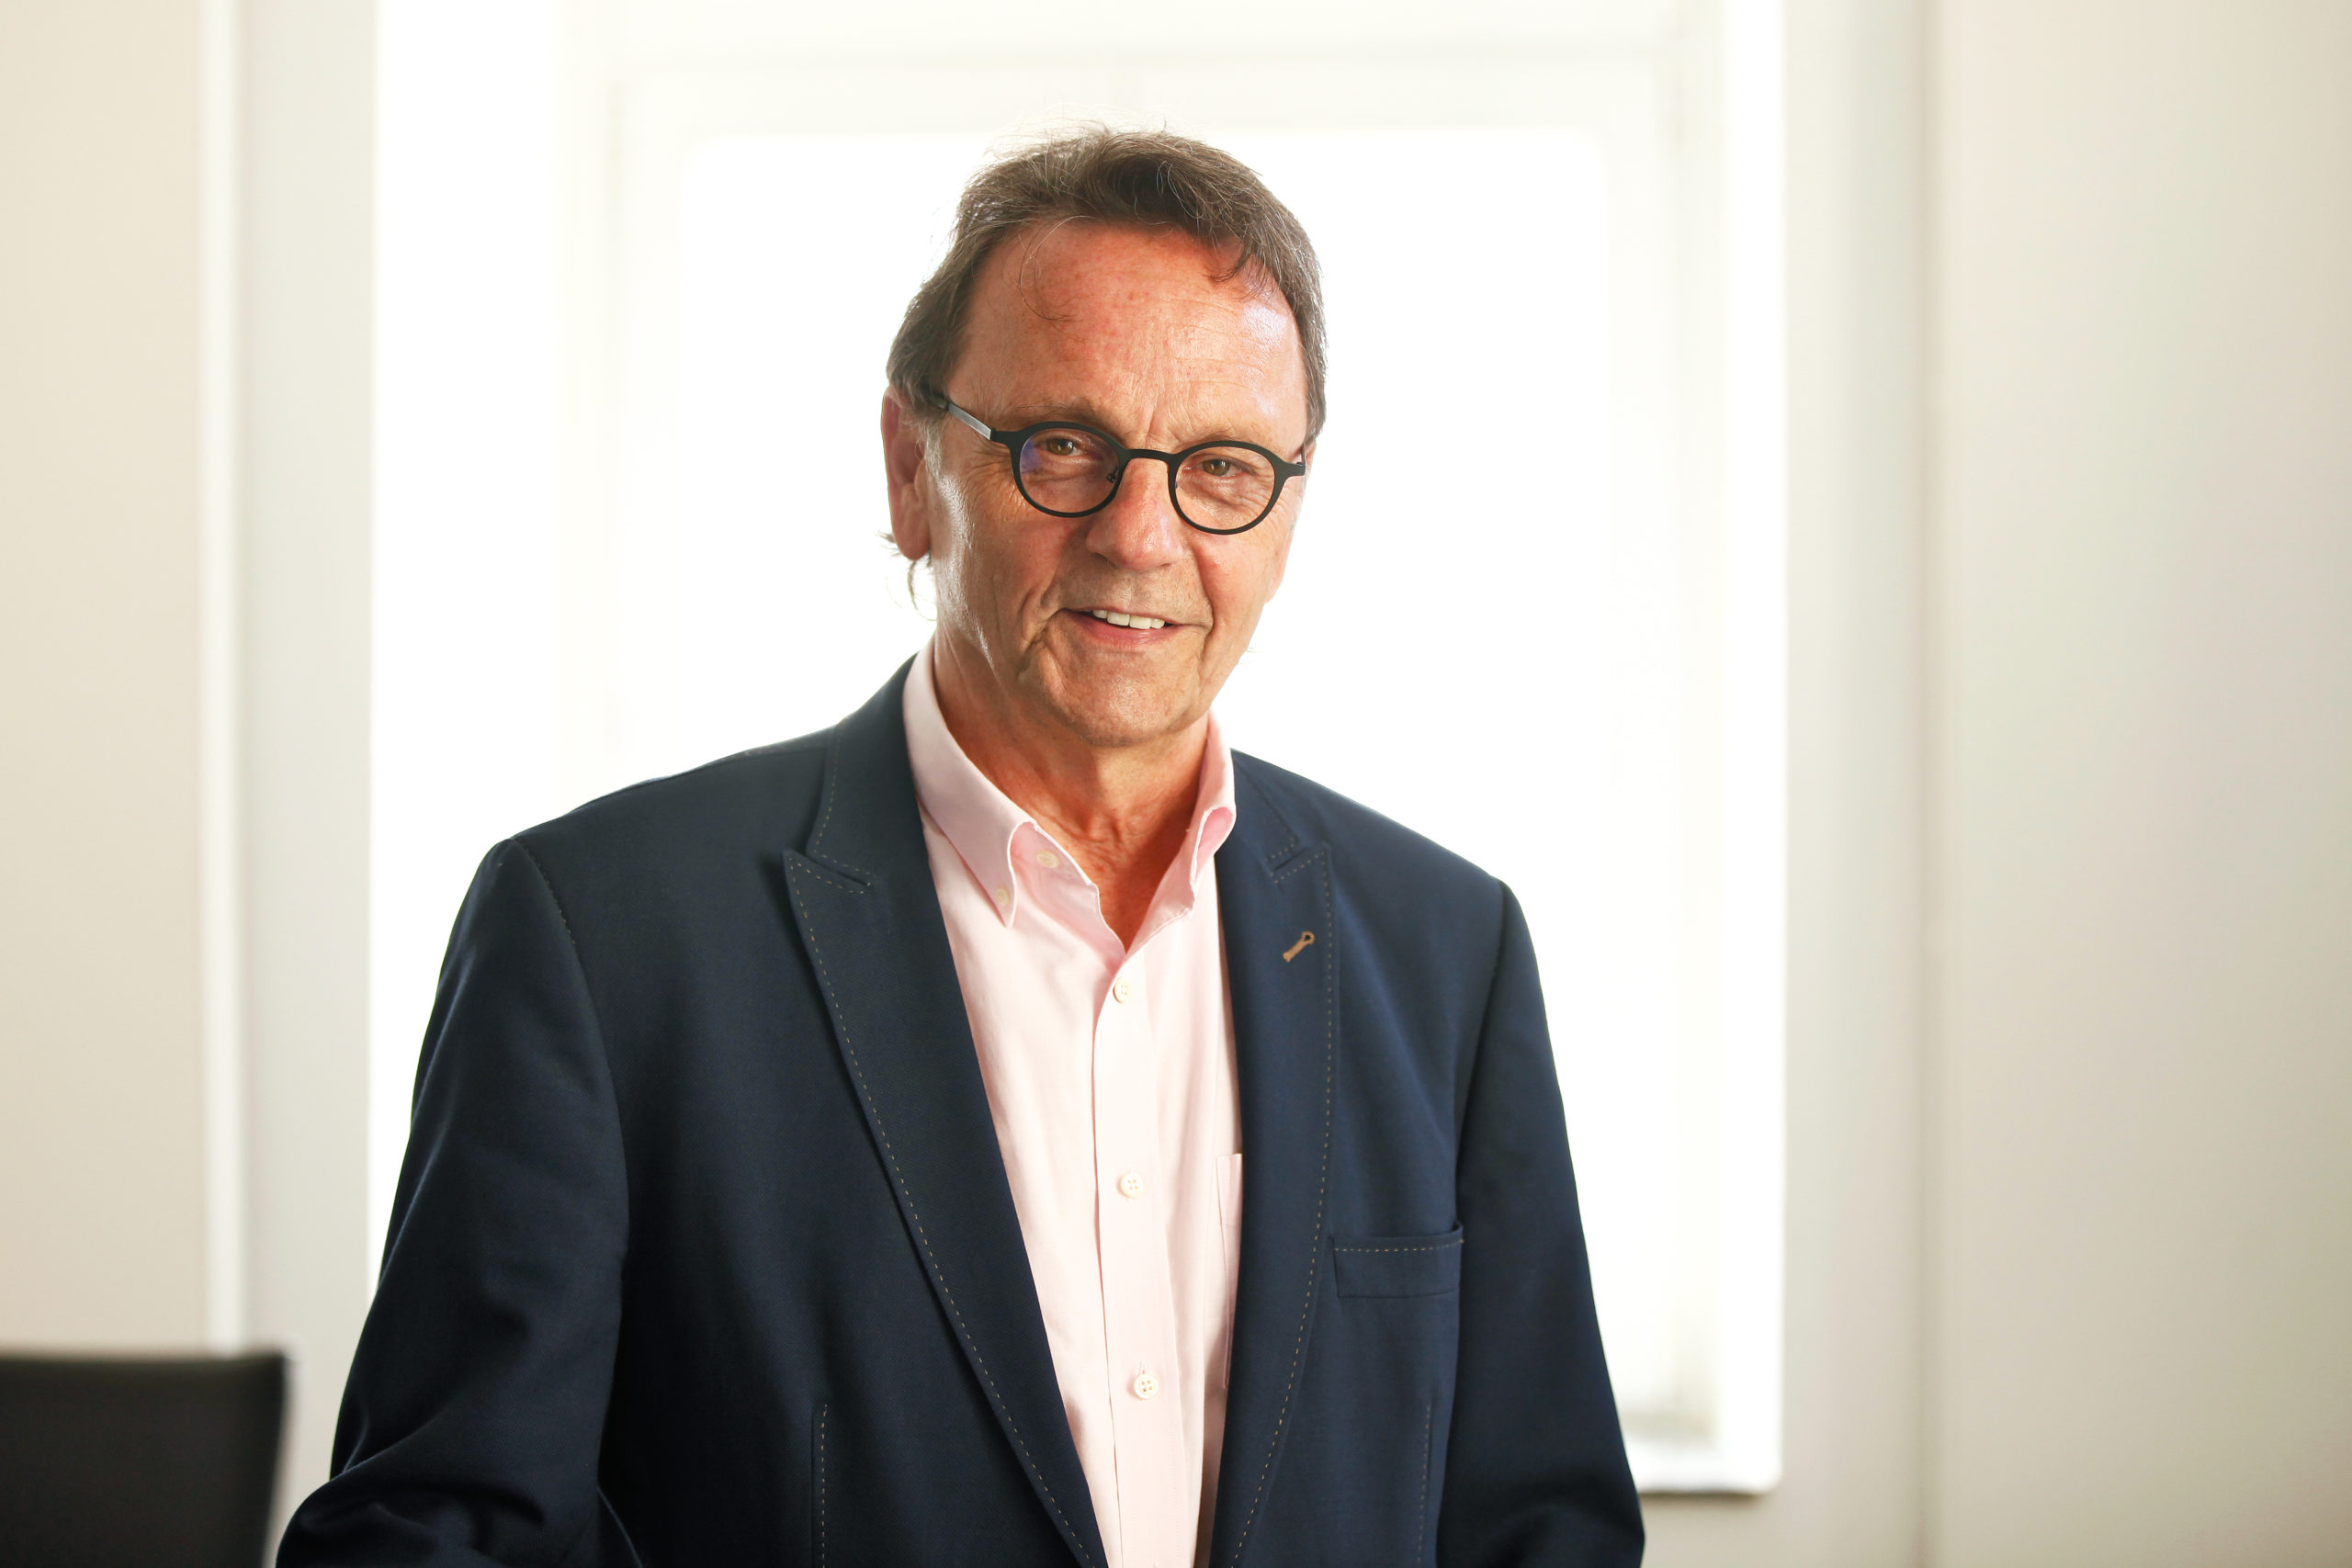 Heinz Siehoff